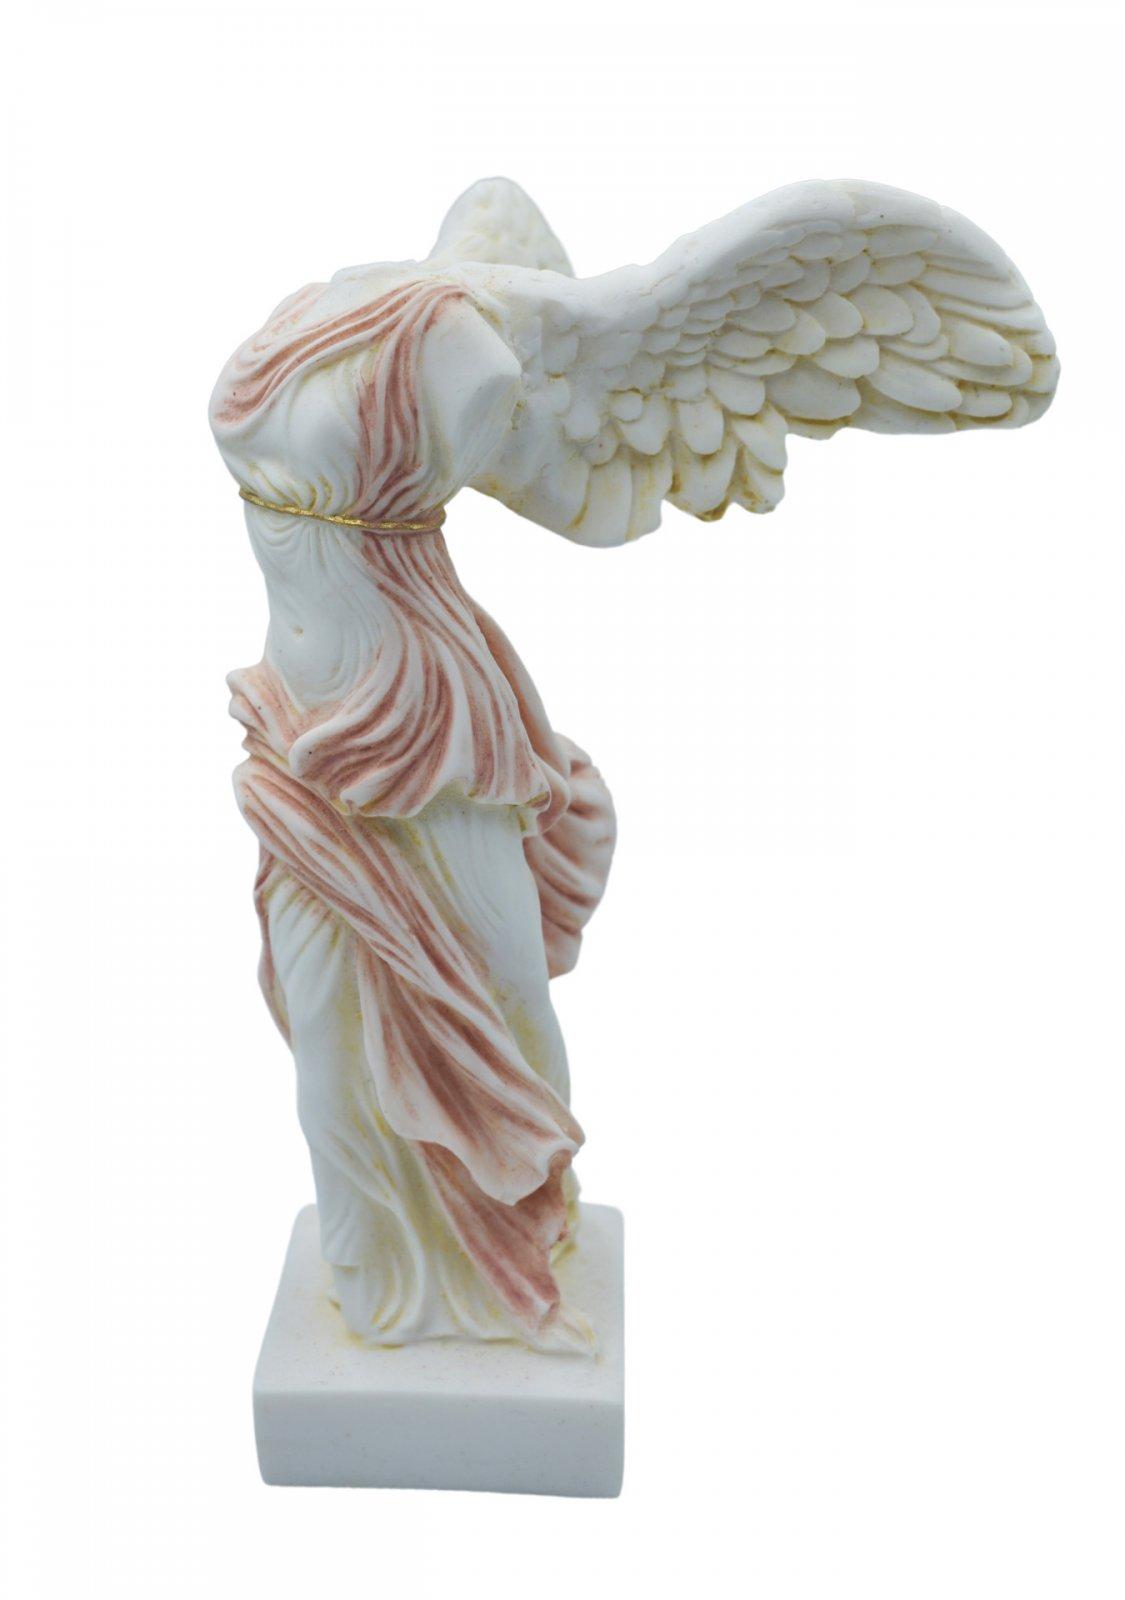 Nike of Samothrace greek alabaster statue with color